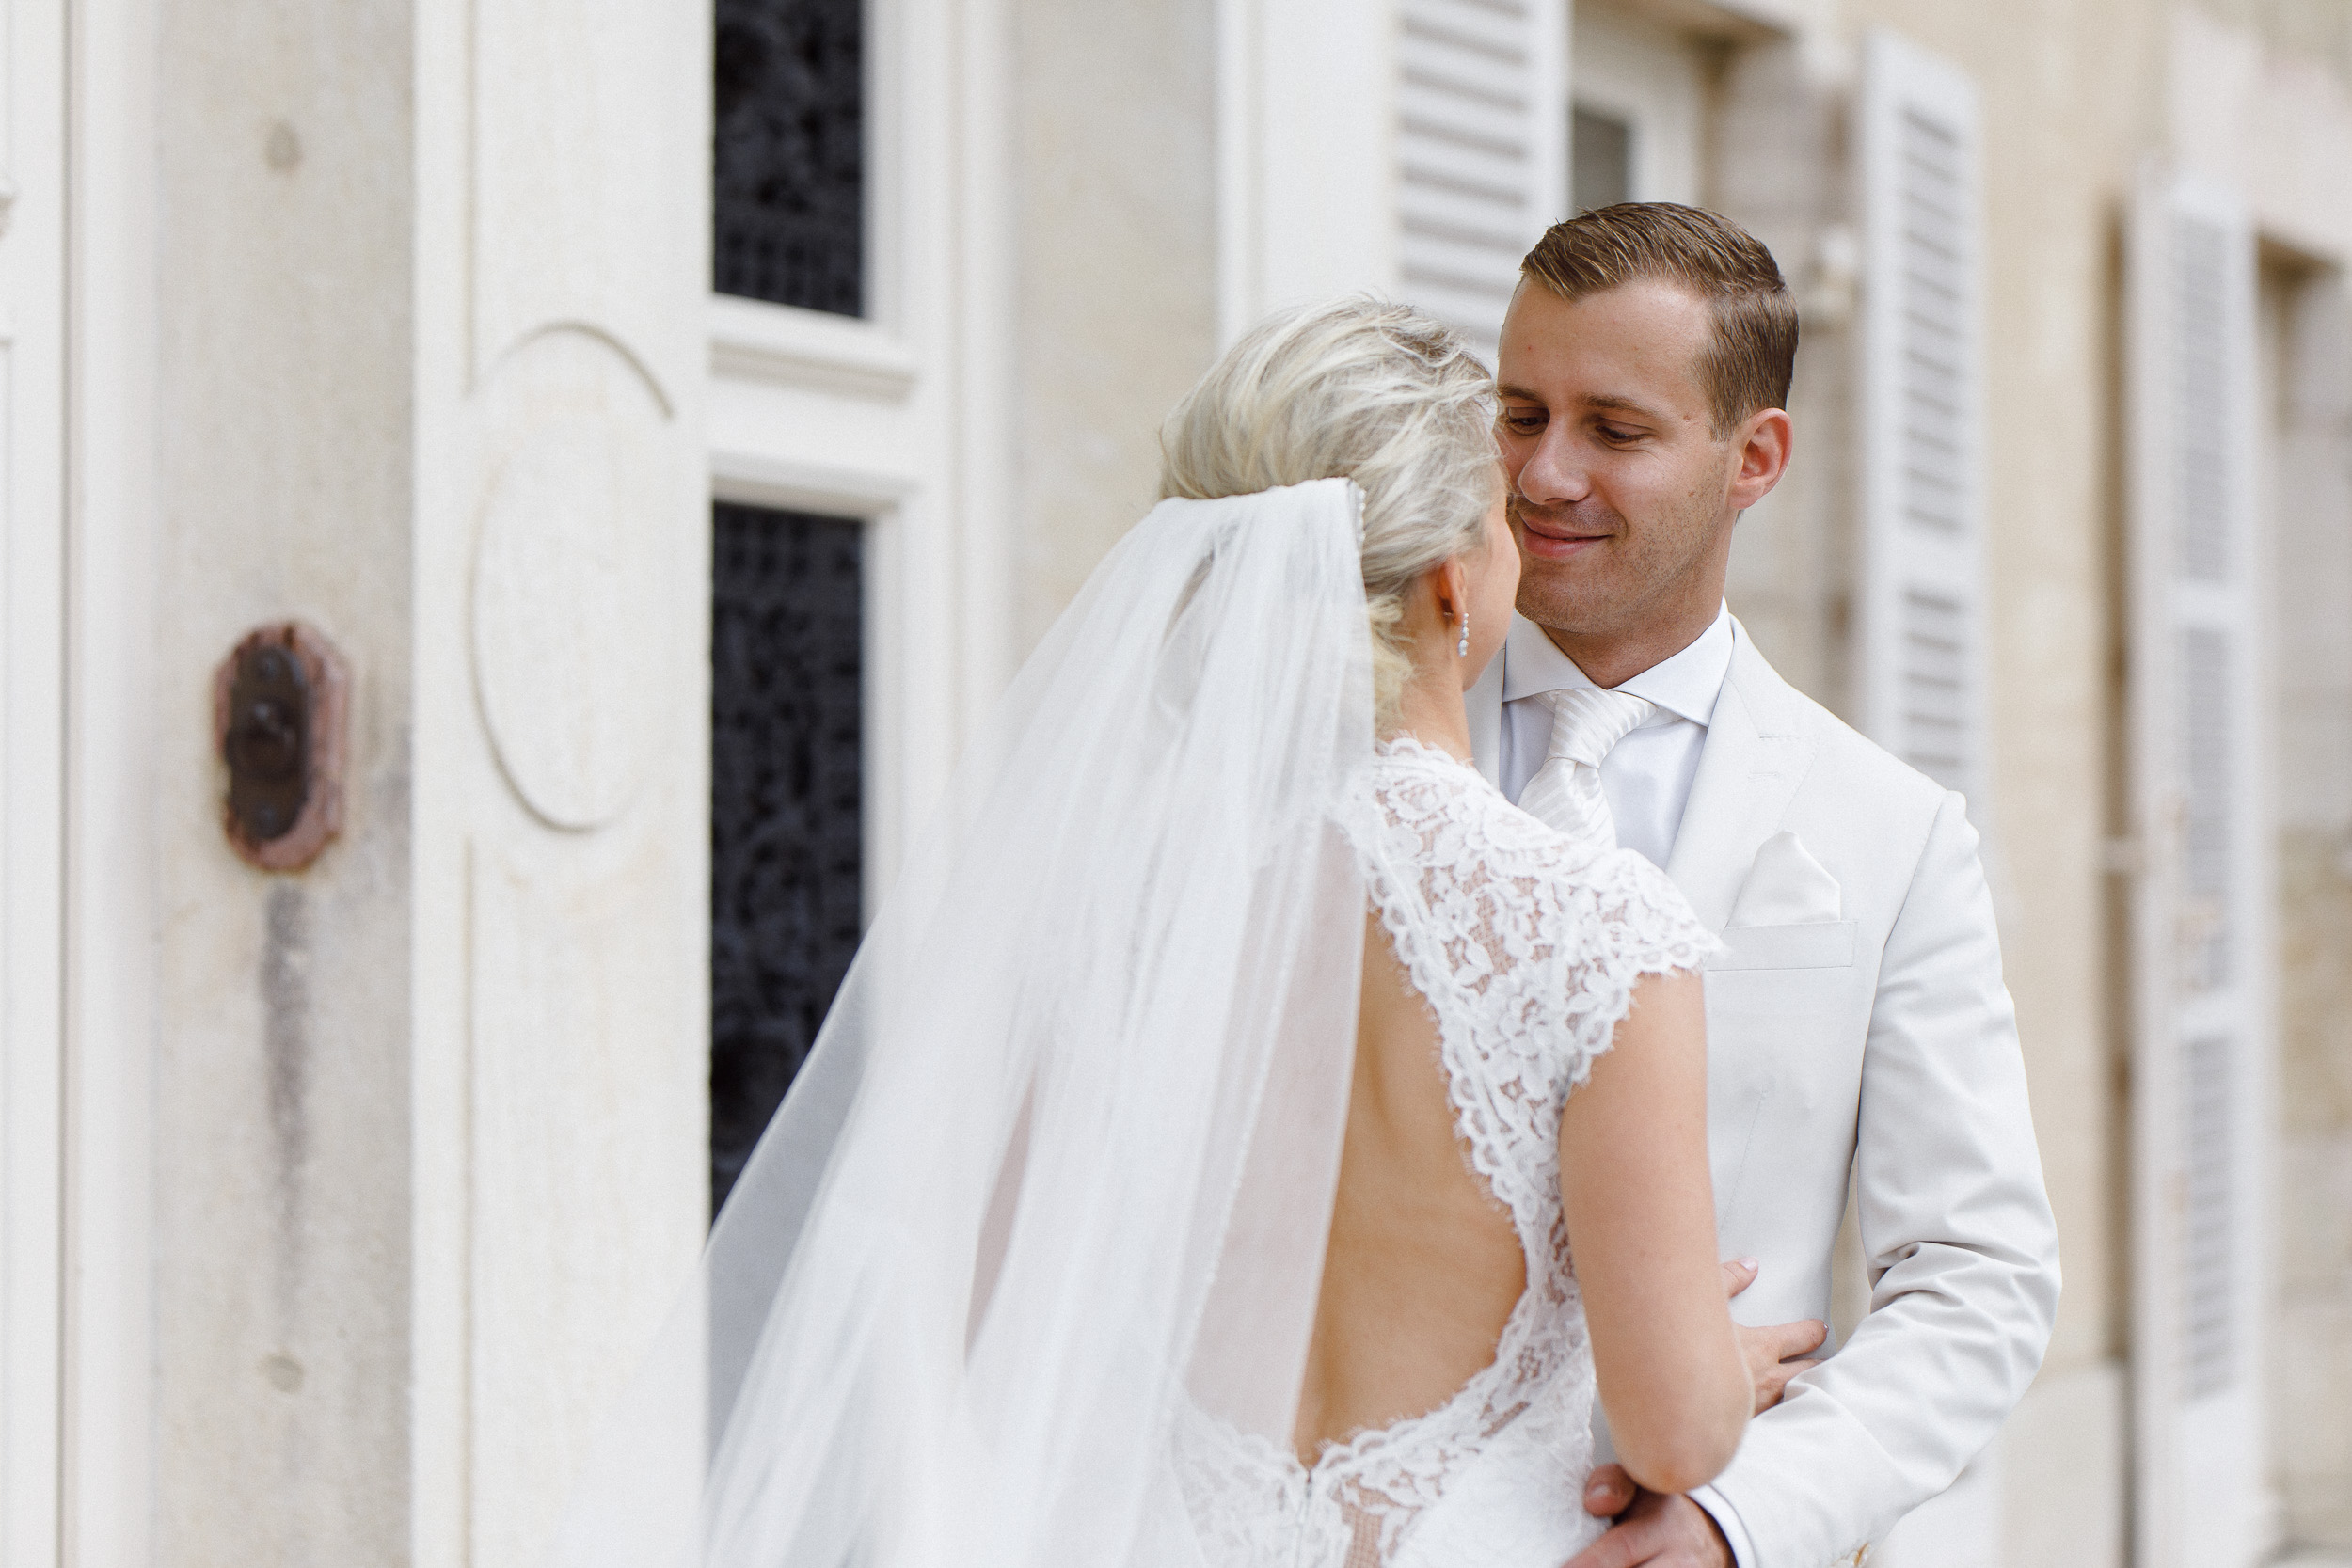 Wedding-Chateau-de-Varennes-068.jpg